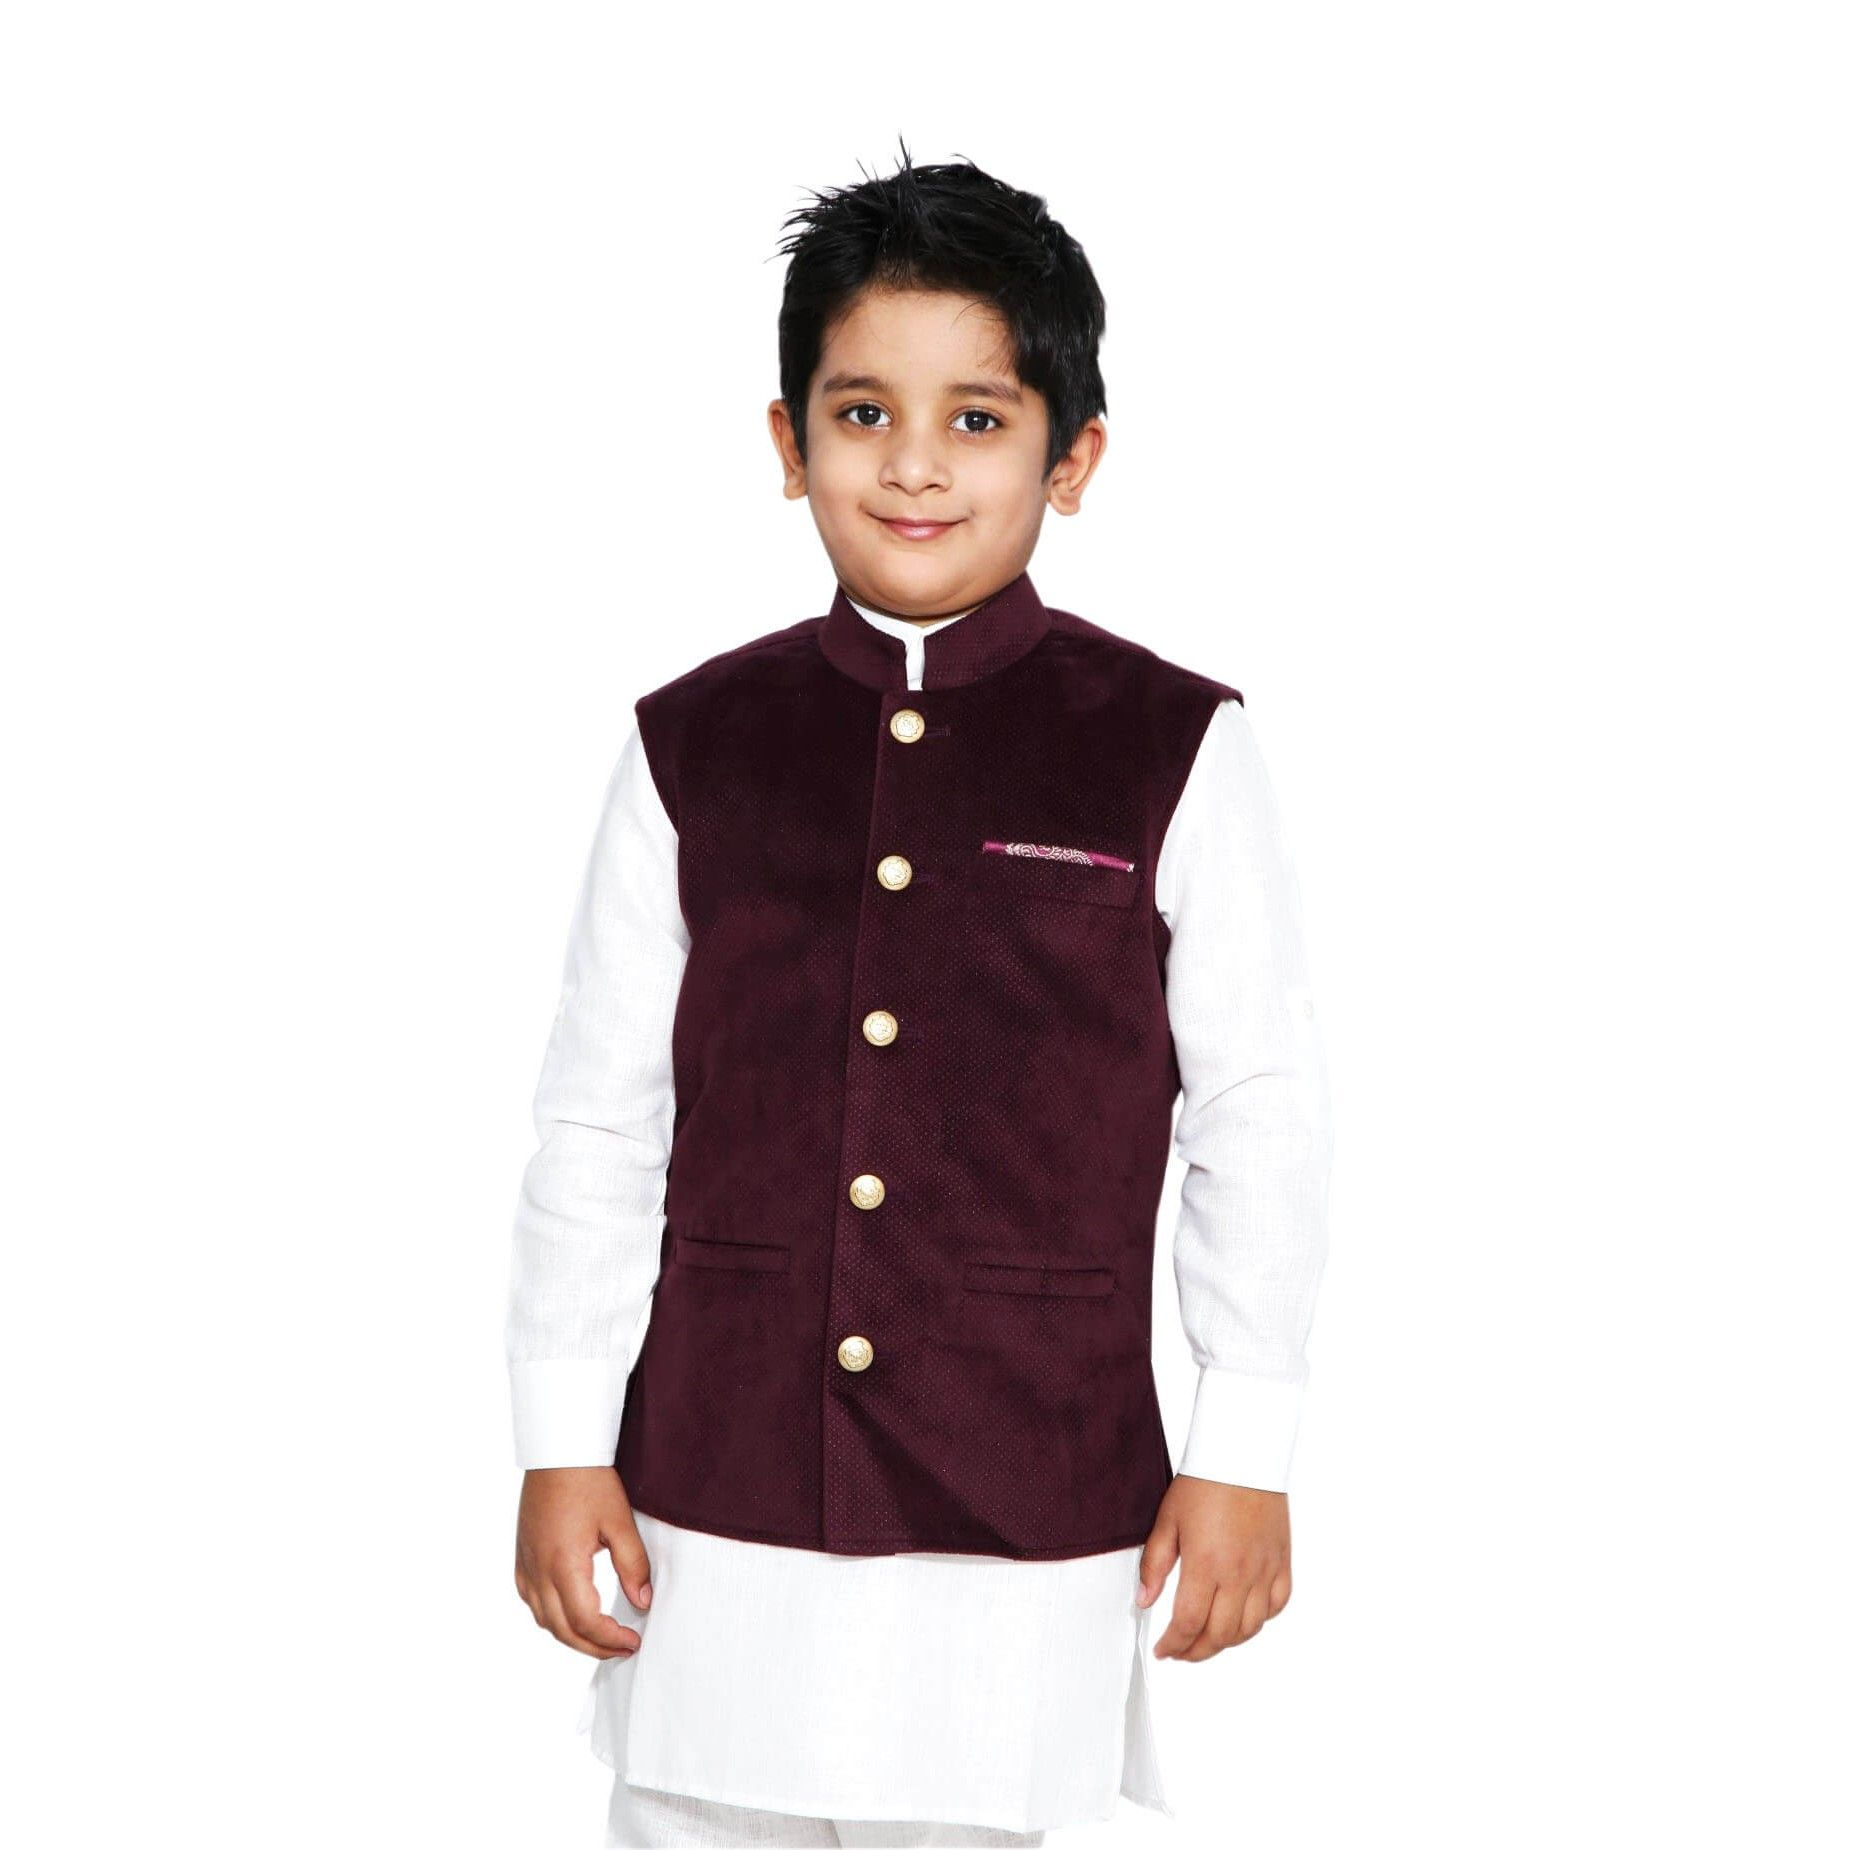 fb9a73421 Baby Boy Nehru Jacket, Maroon Party Wear Nehru Jacket for Kids, Indian  Traditional Modi Jacket, Children Ethnic Wear for Weddings & Festivals  #Benzer ...